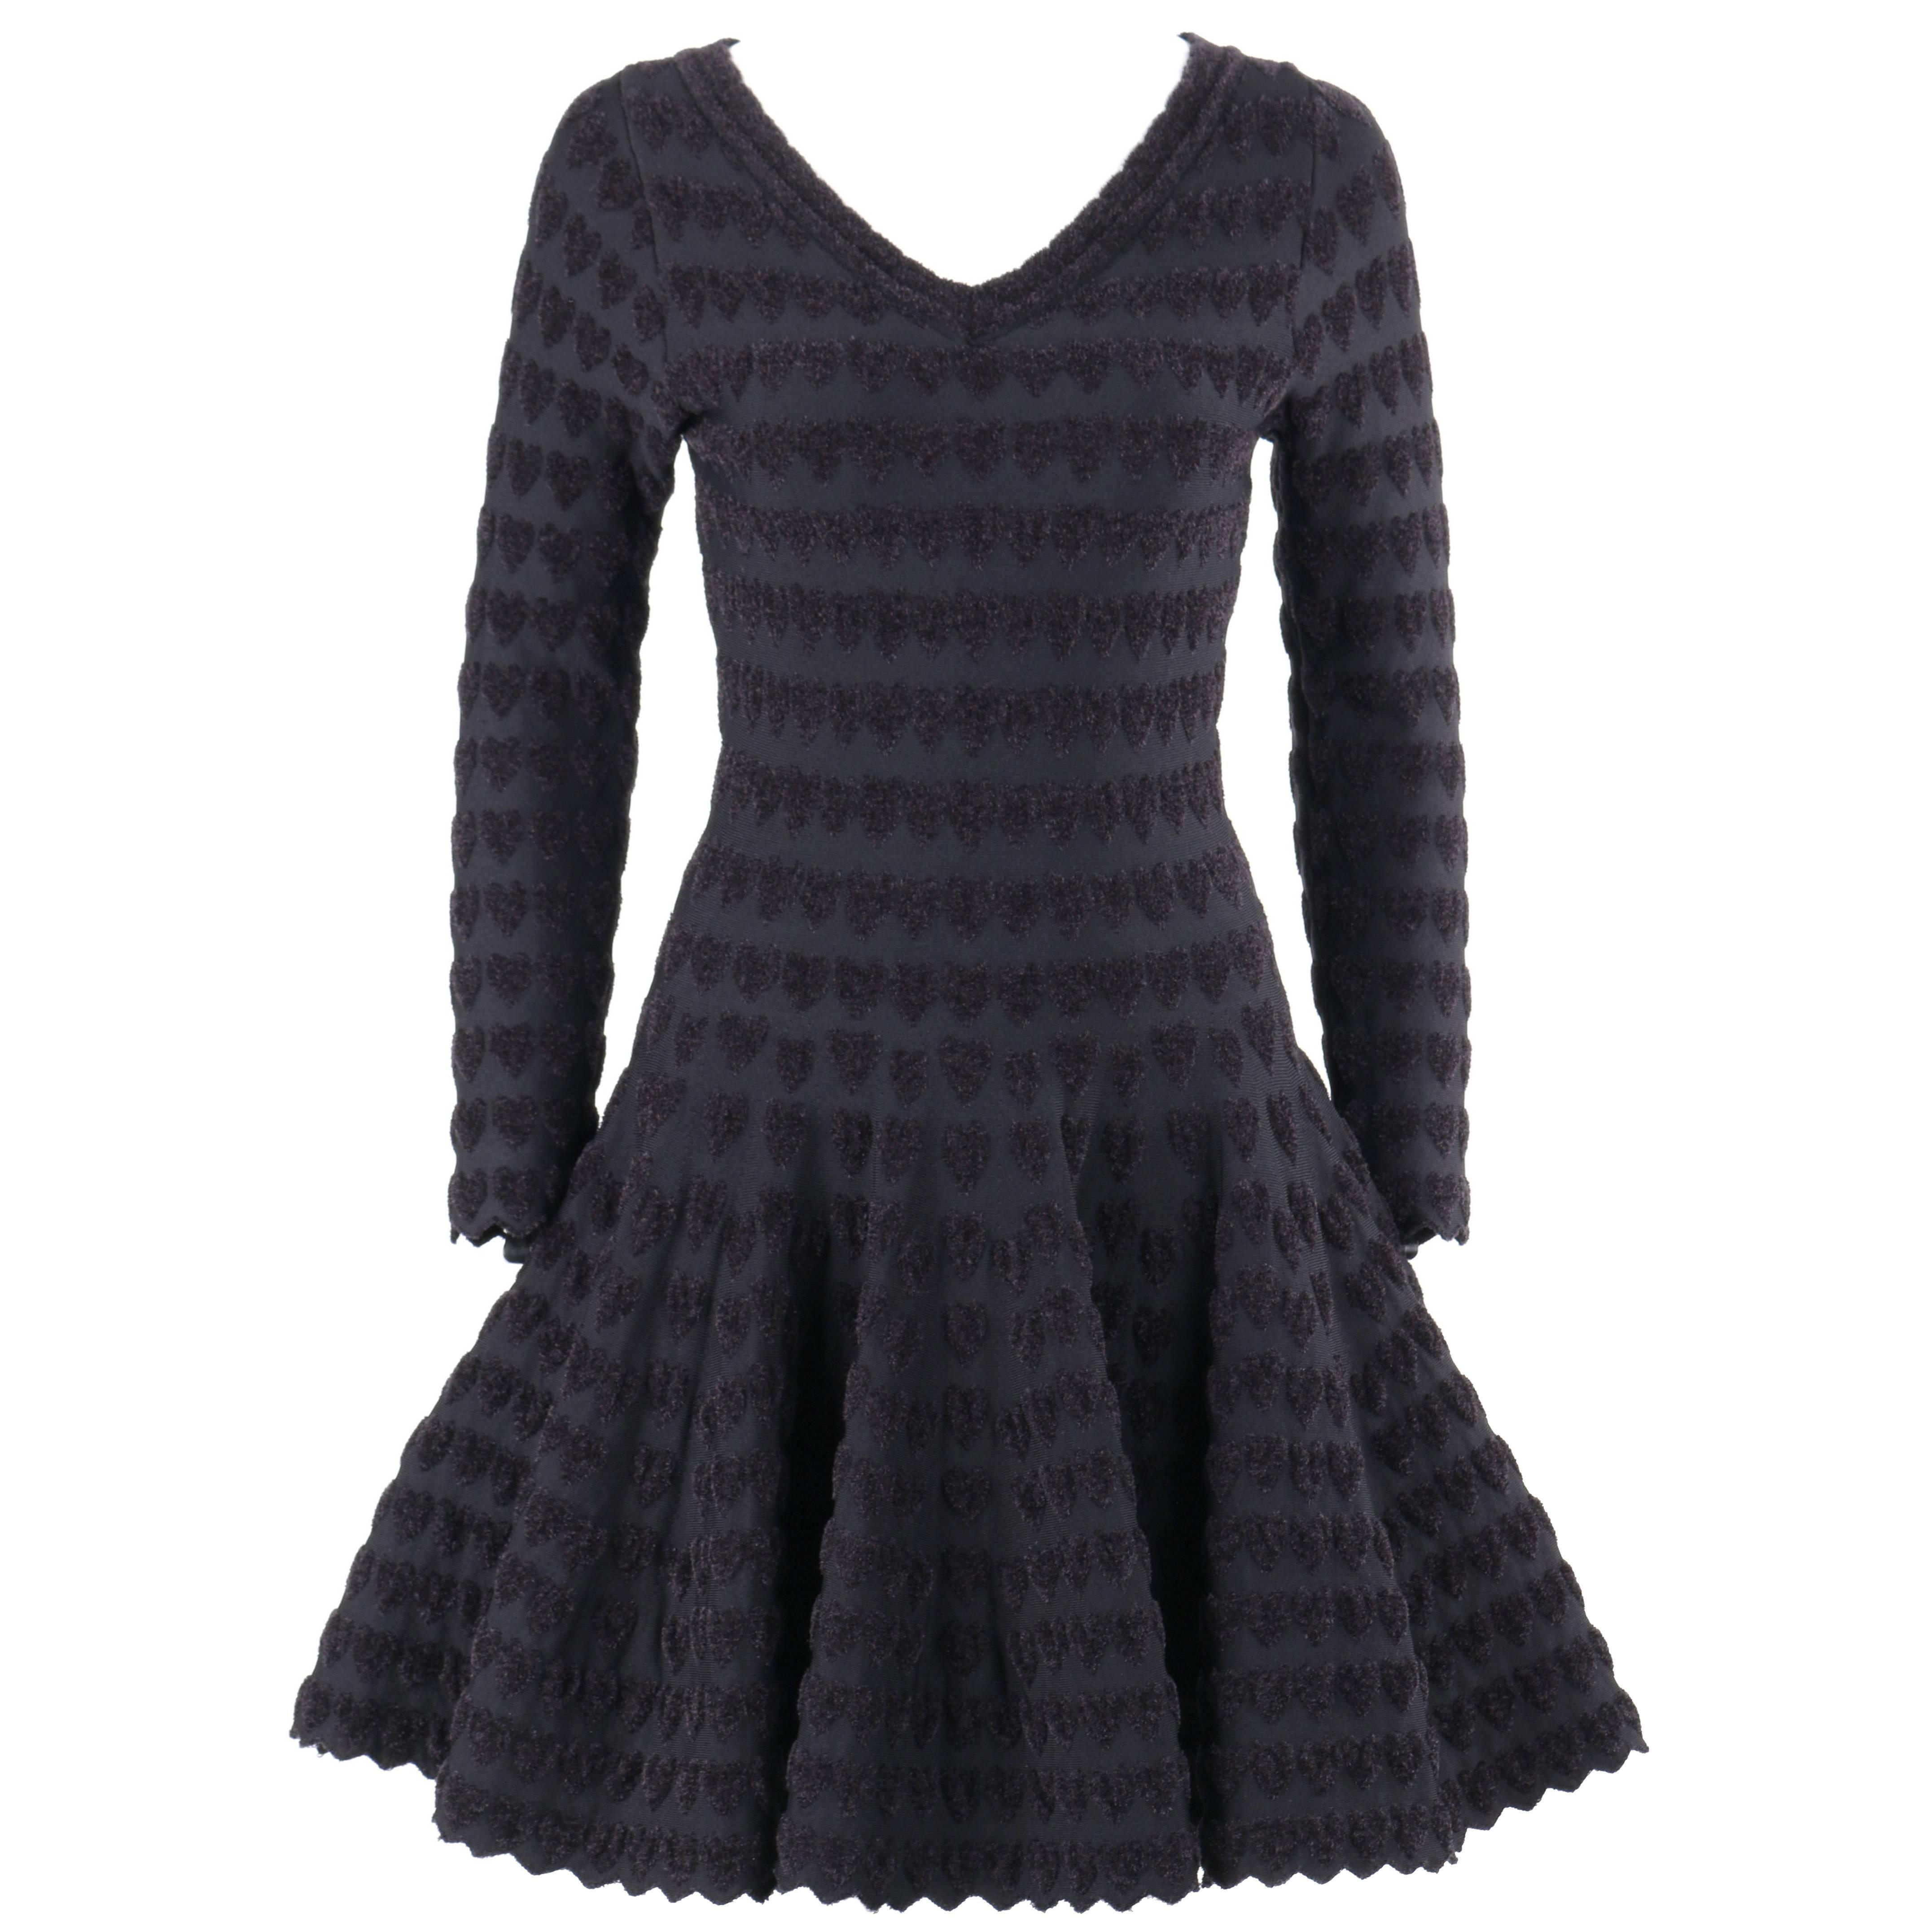 ALAIA Paris Black Heart Patterned Knit Fit & Flare Cocktail Dress